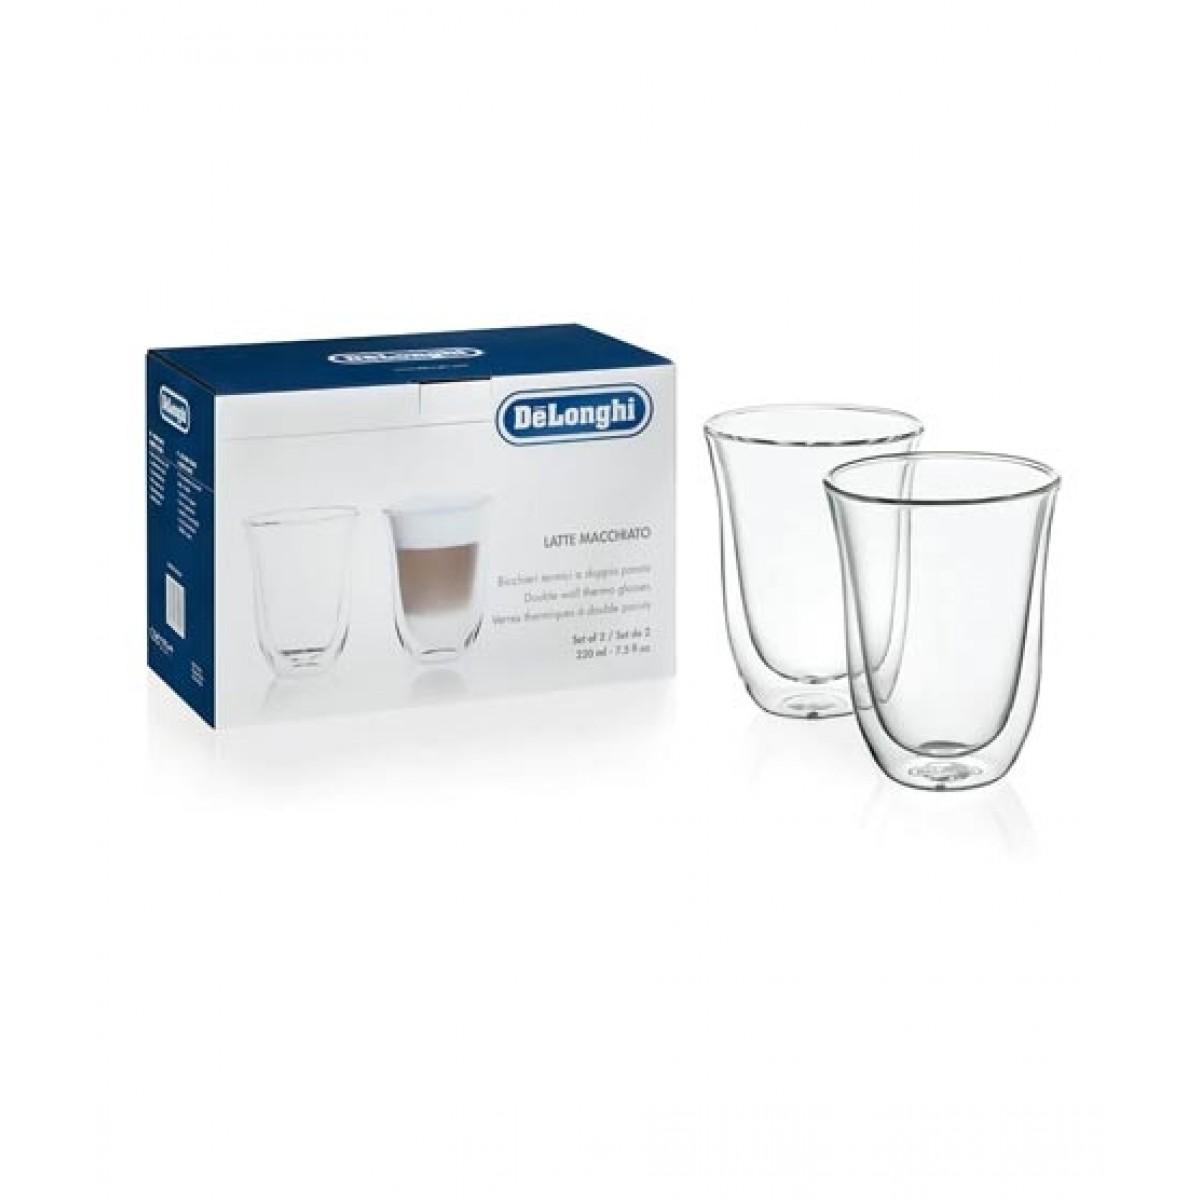 Delonghi Macchiato Glasses - Pack of 2